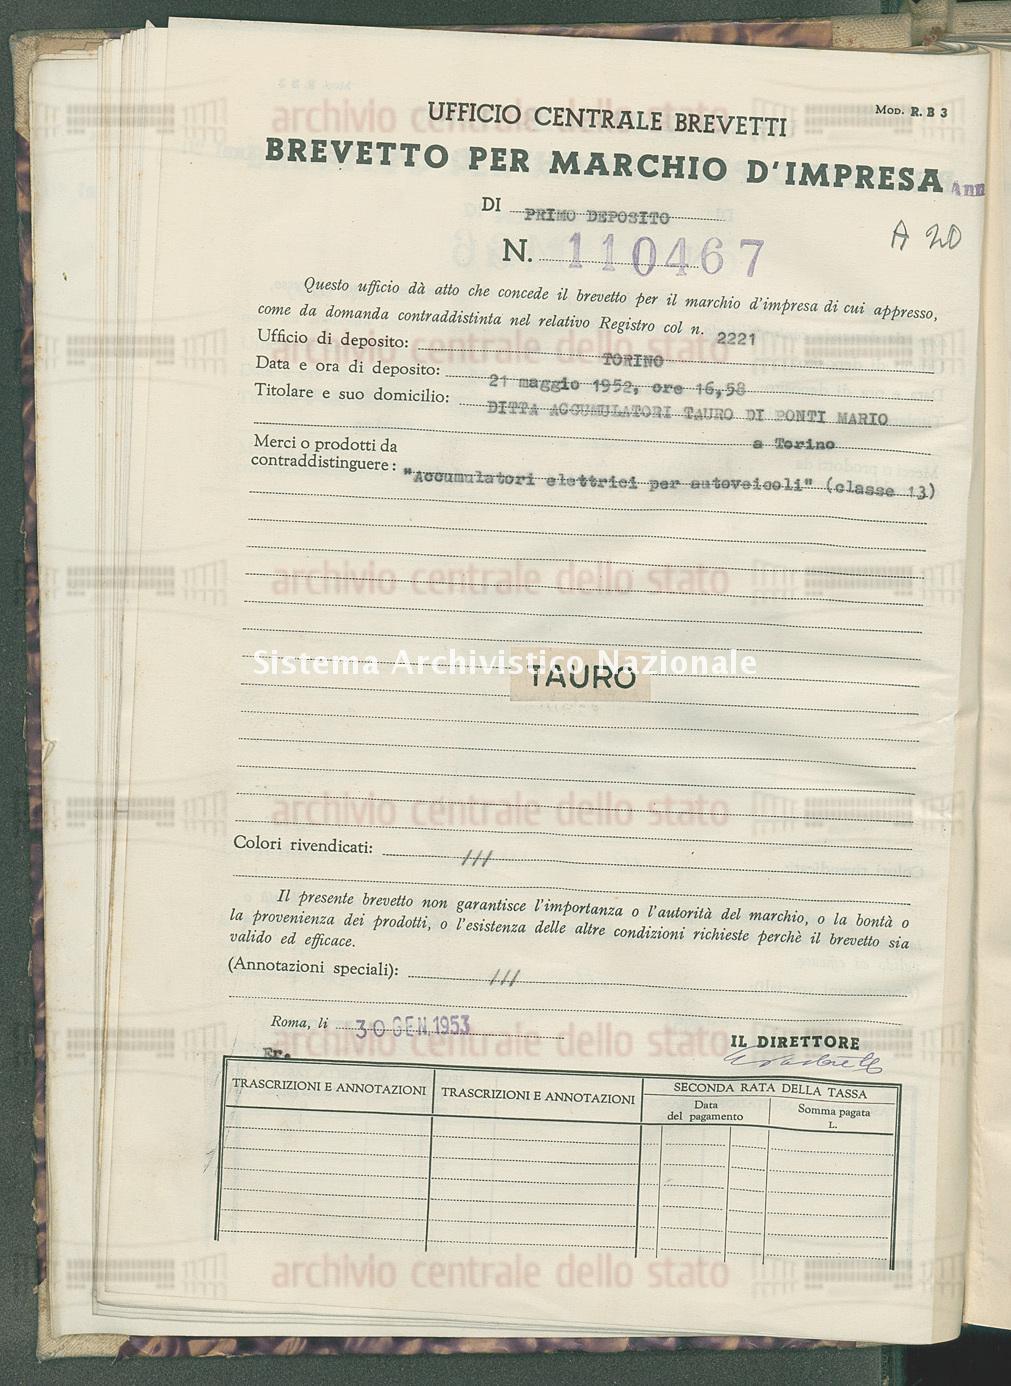 'Accumulatori elettrici per autoveicoli' Ditta Accumulatori Tauro Di Ponti Mario (30/01/1953)